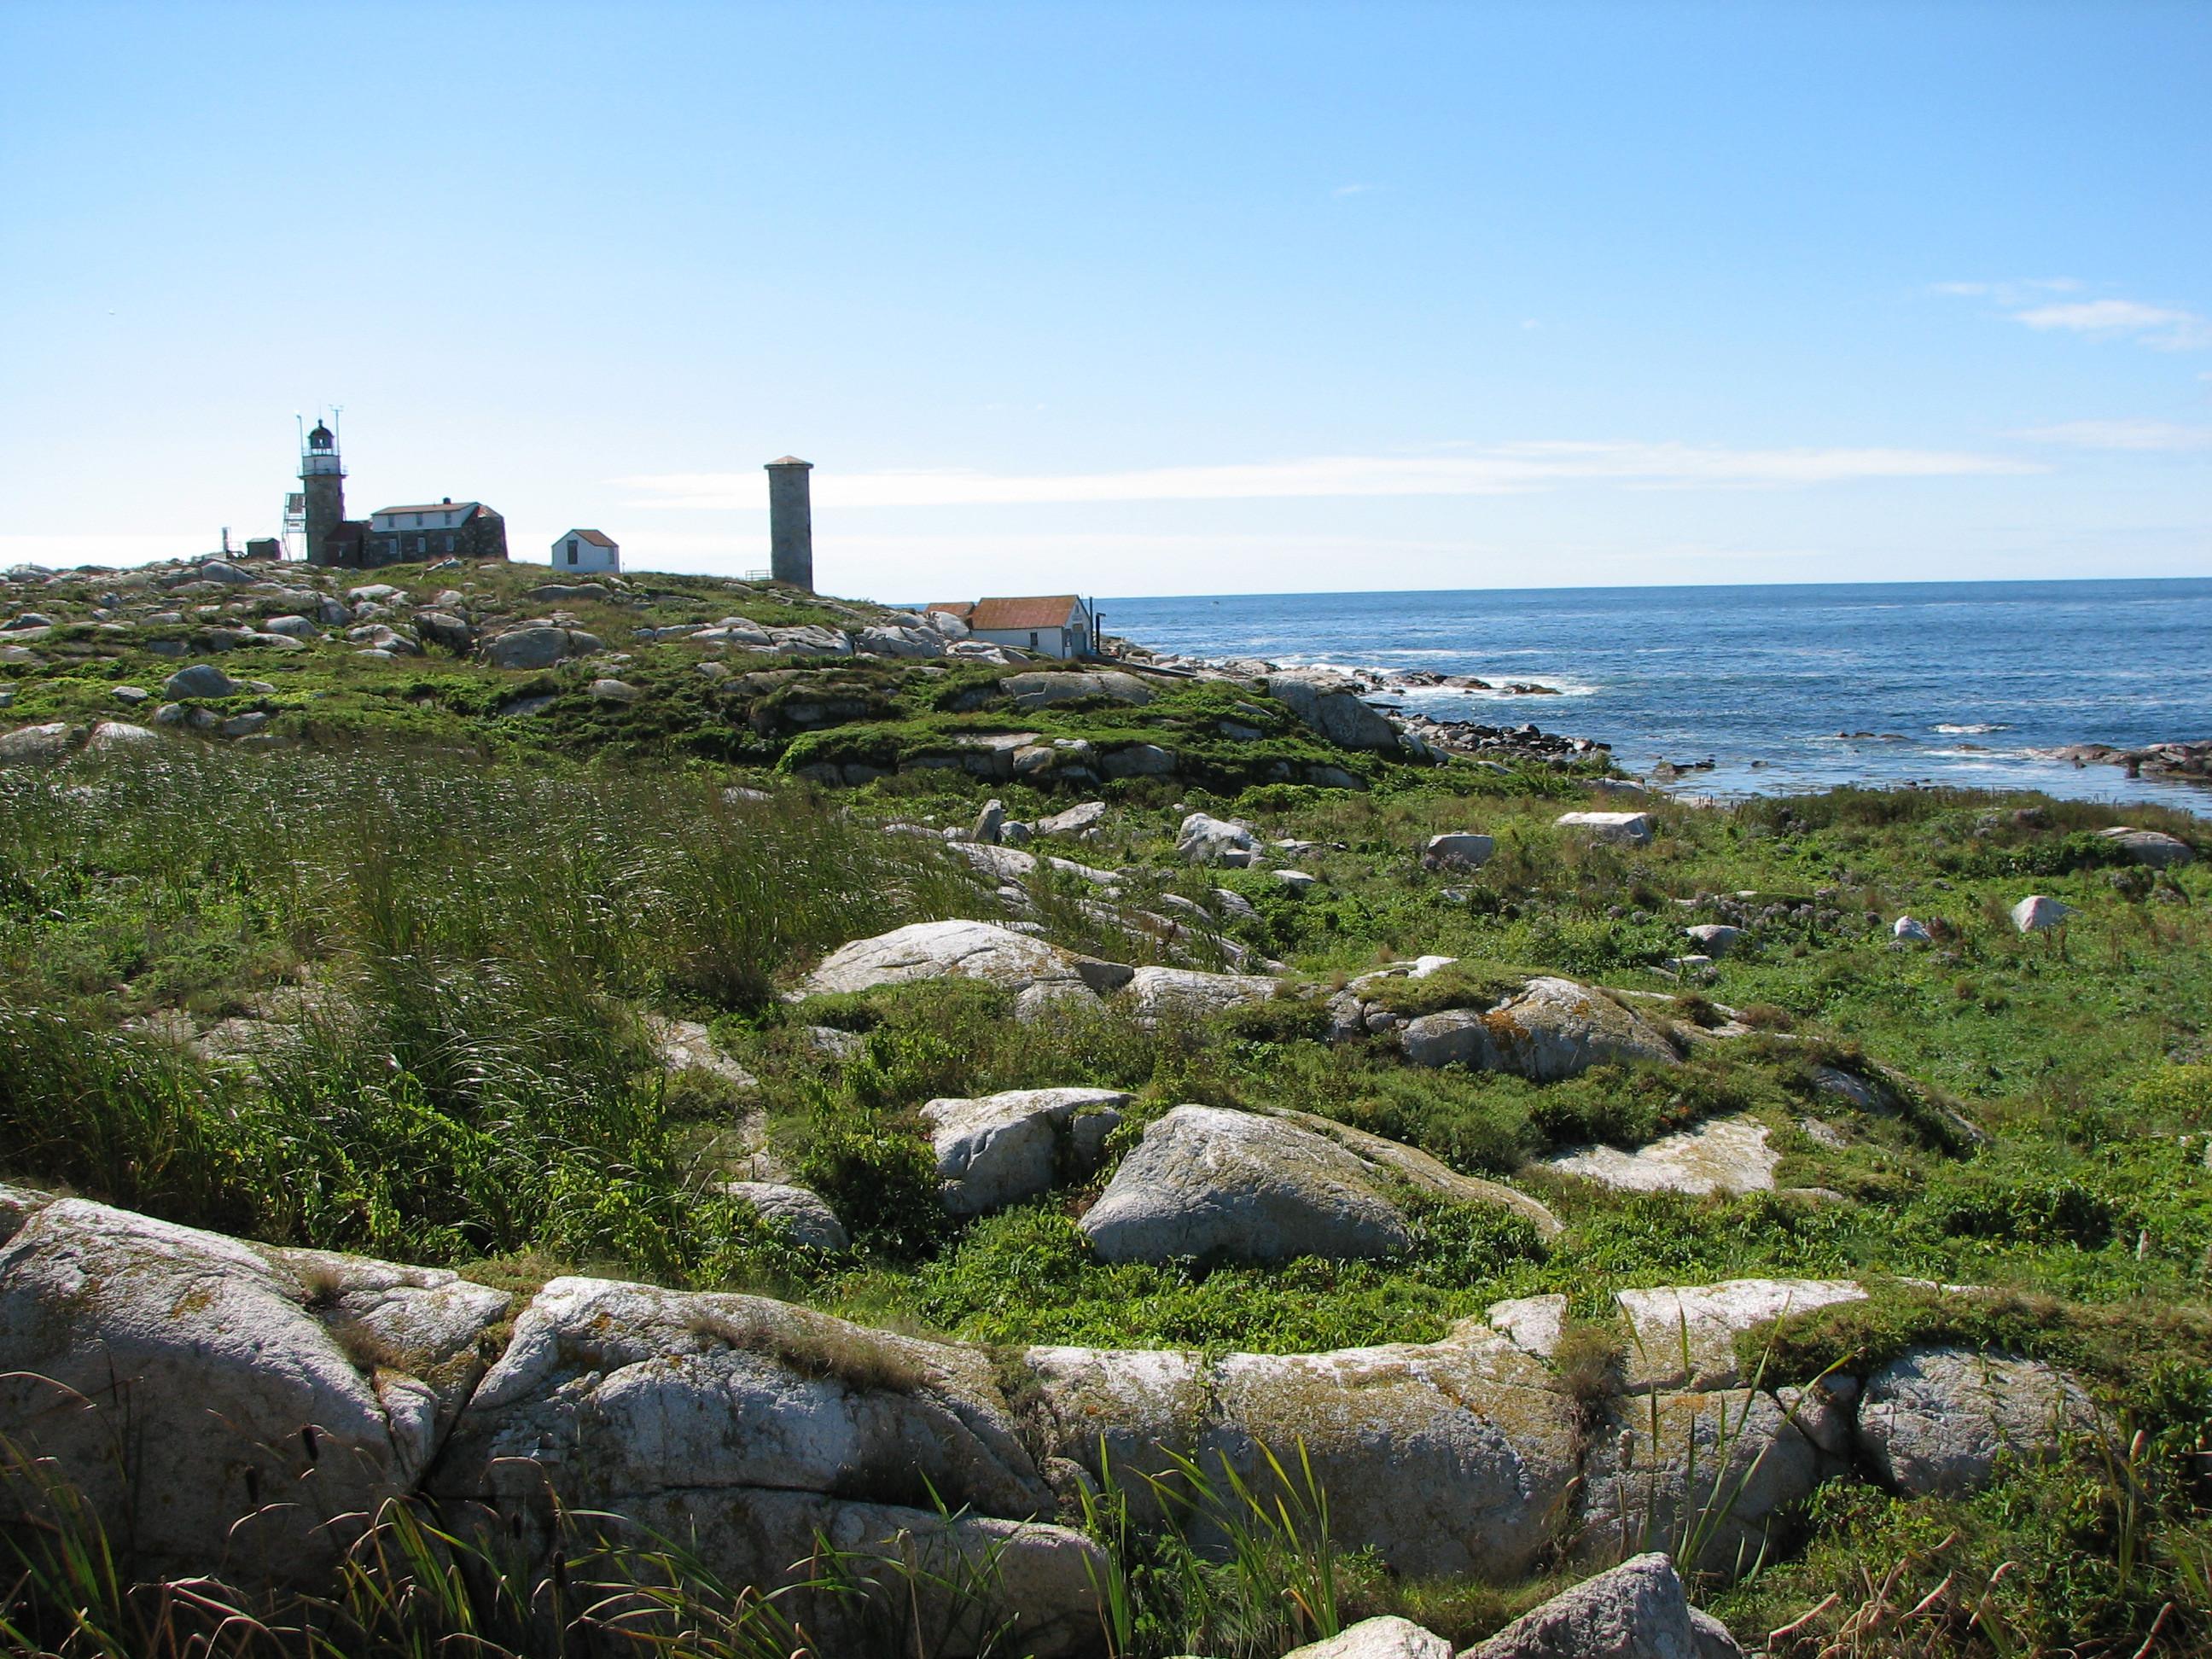 Mantinicus Island